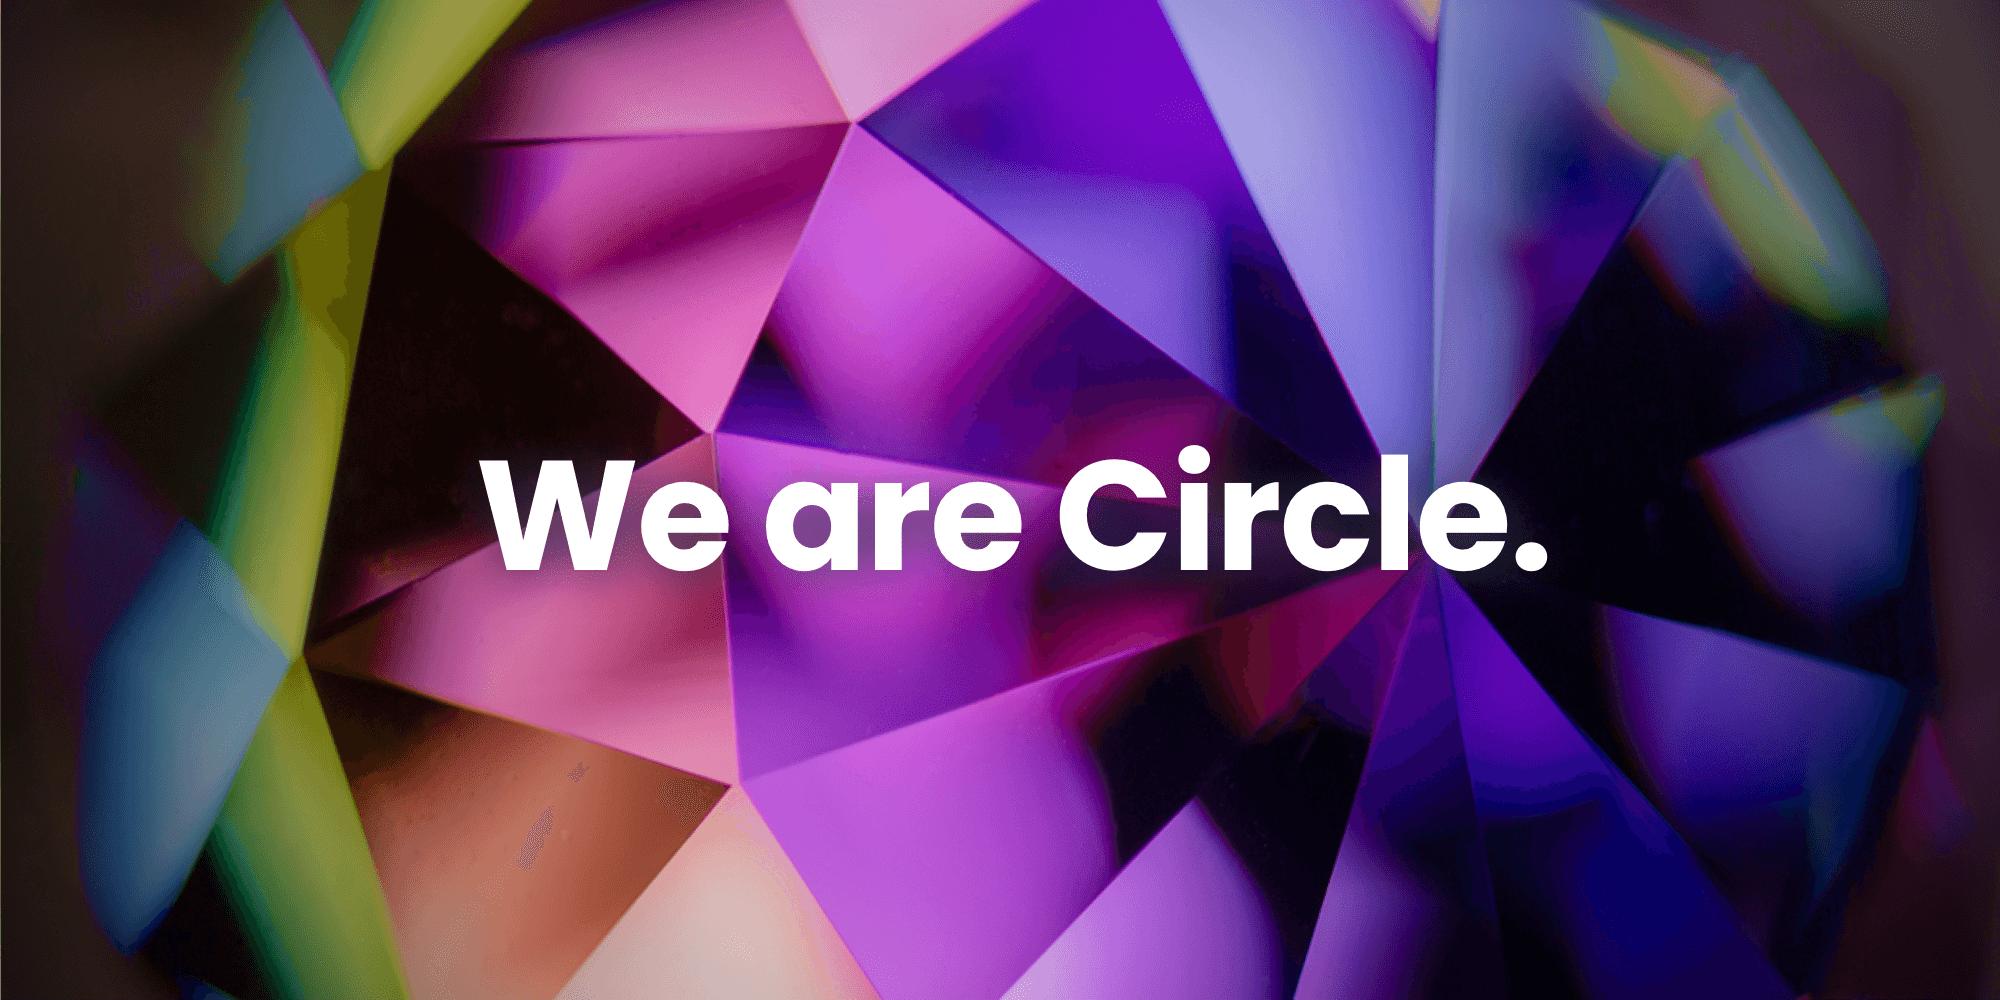 circle-mission